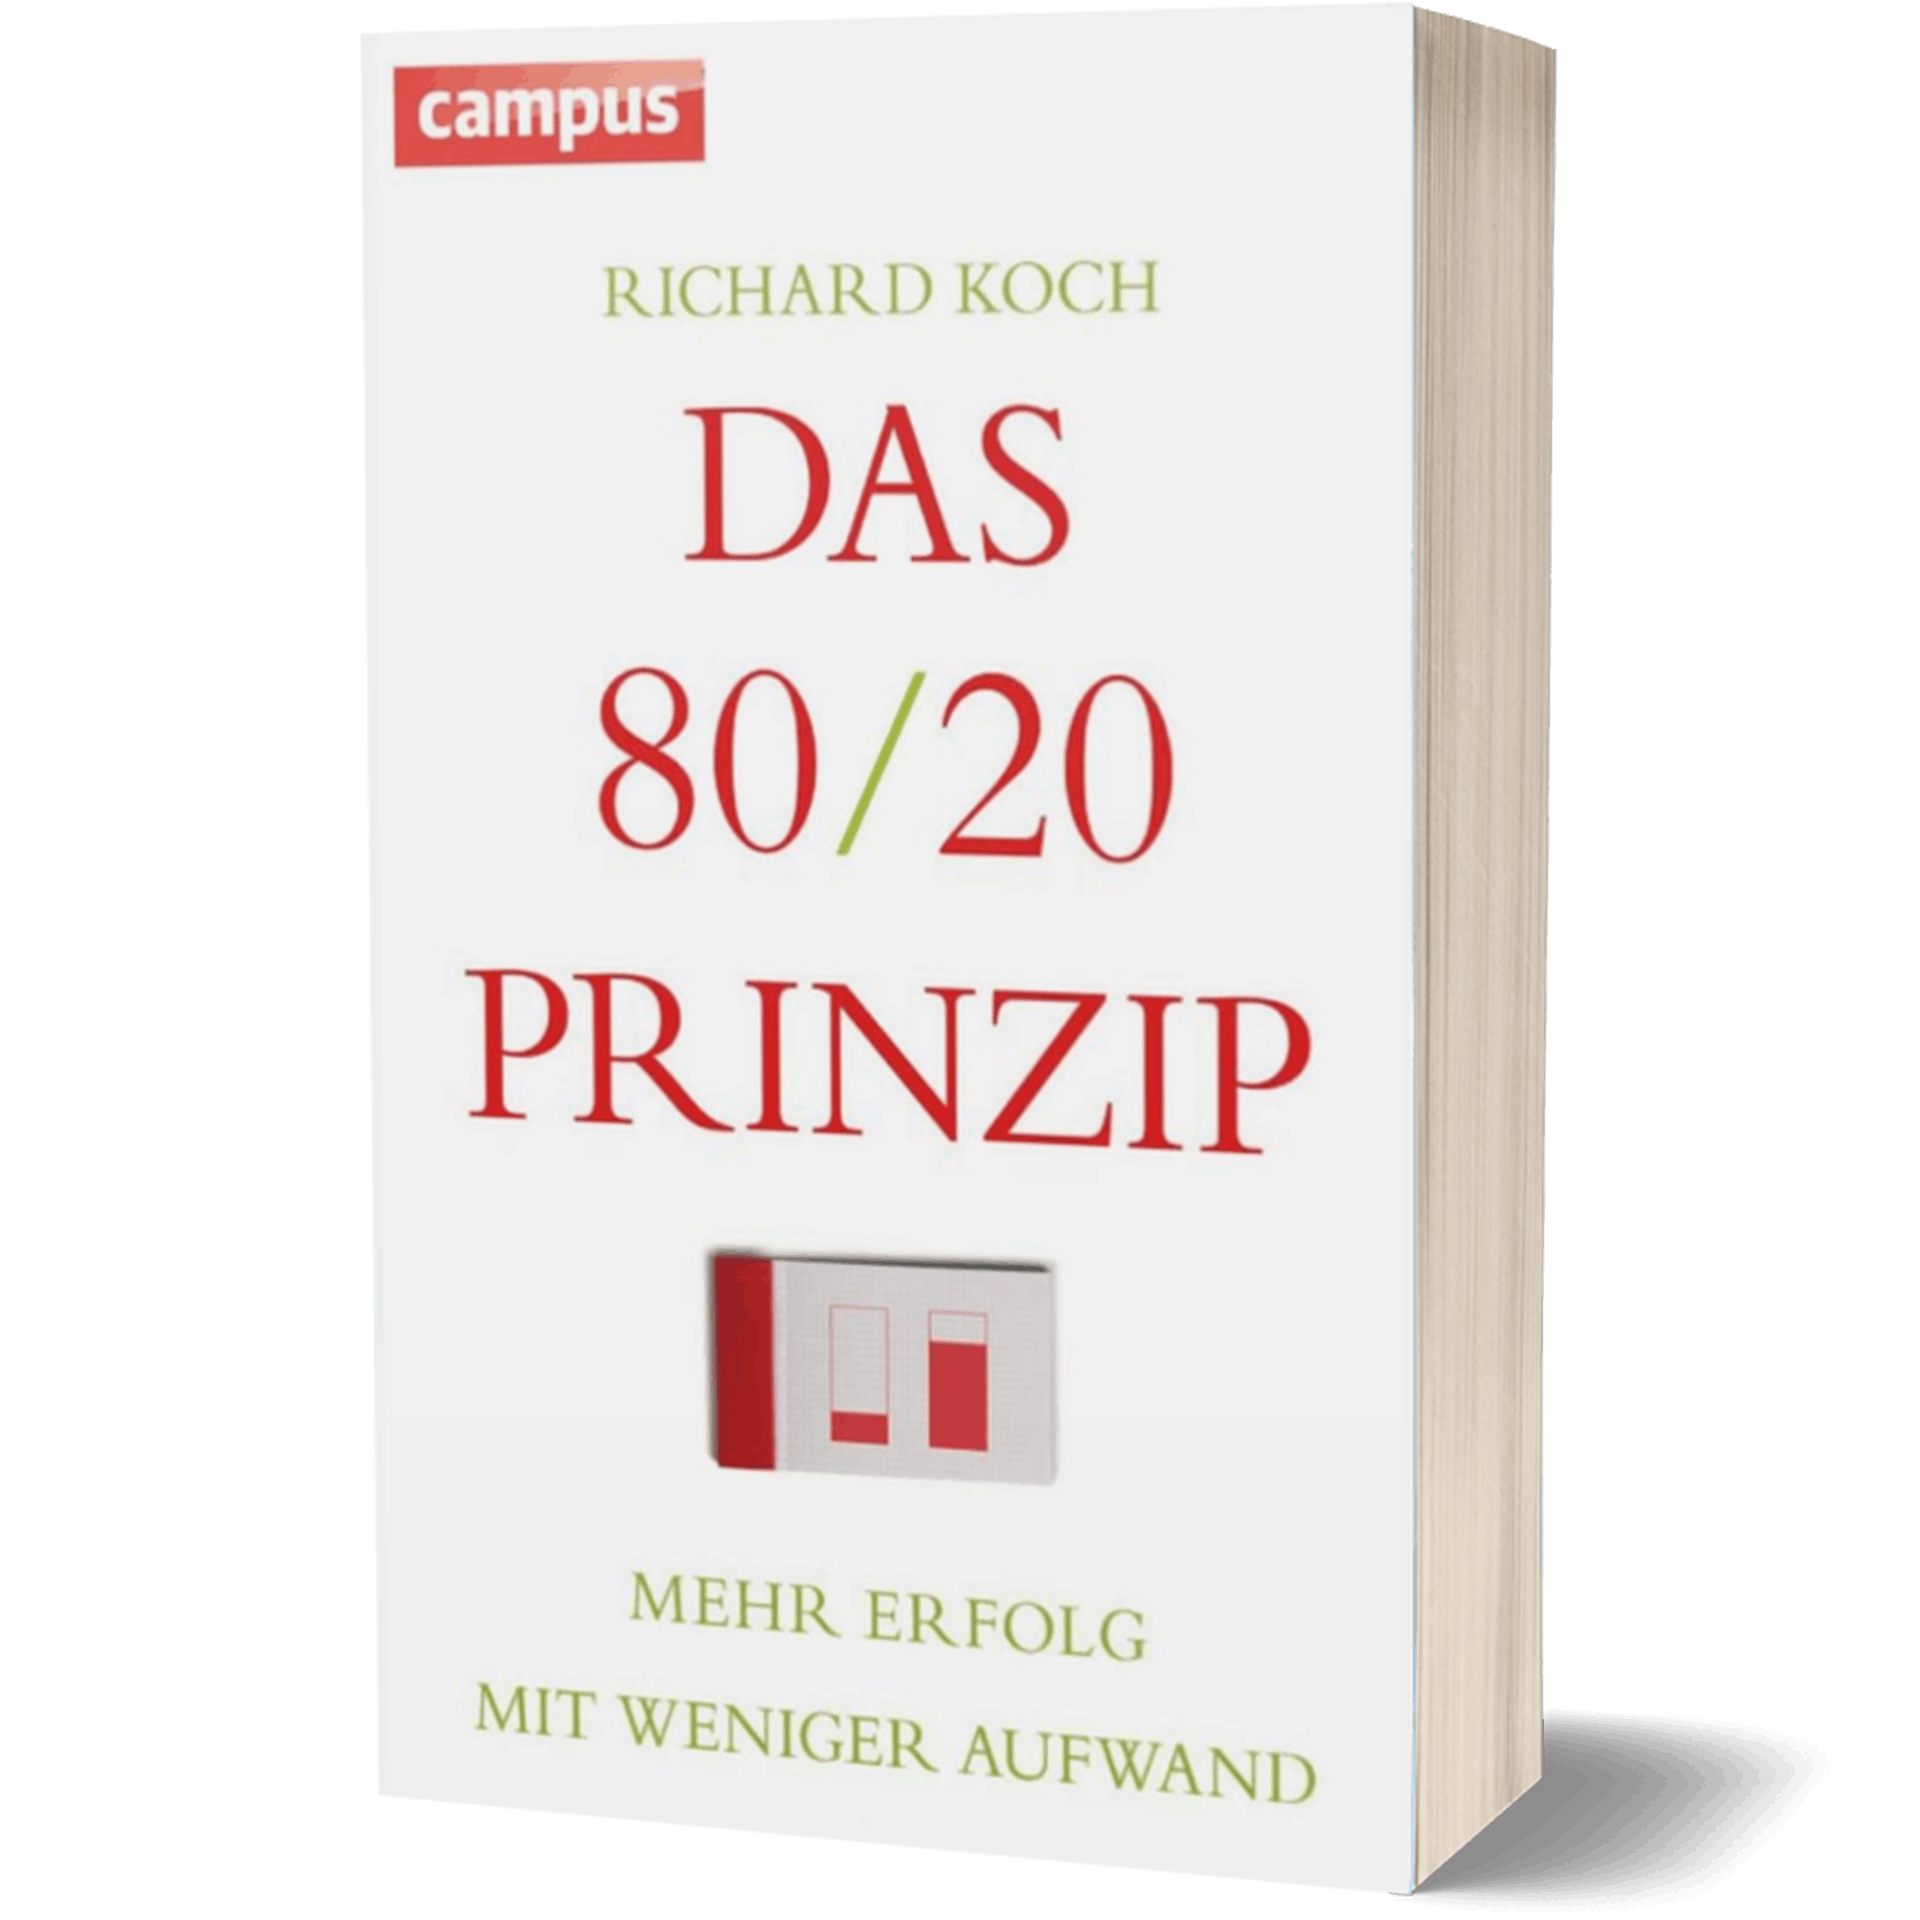 20 80 prinzip